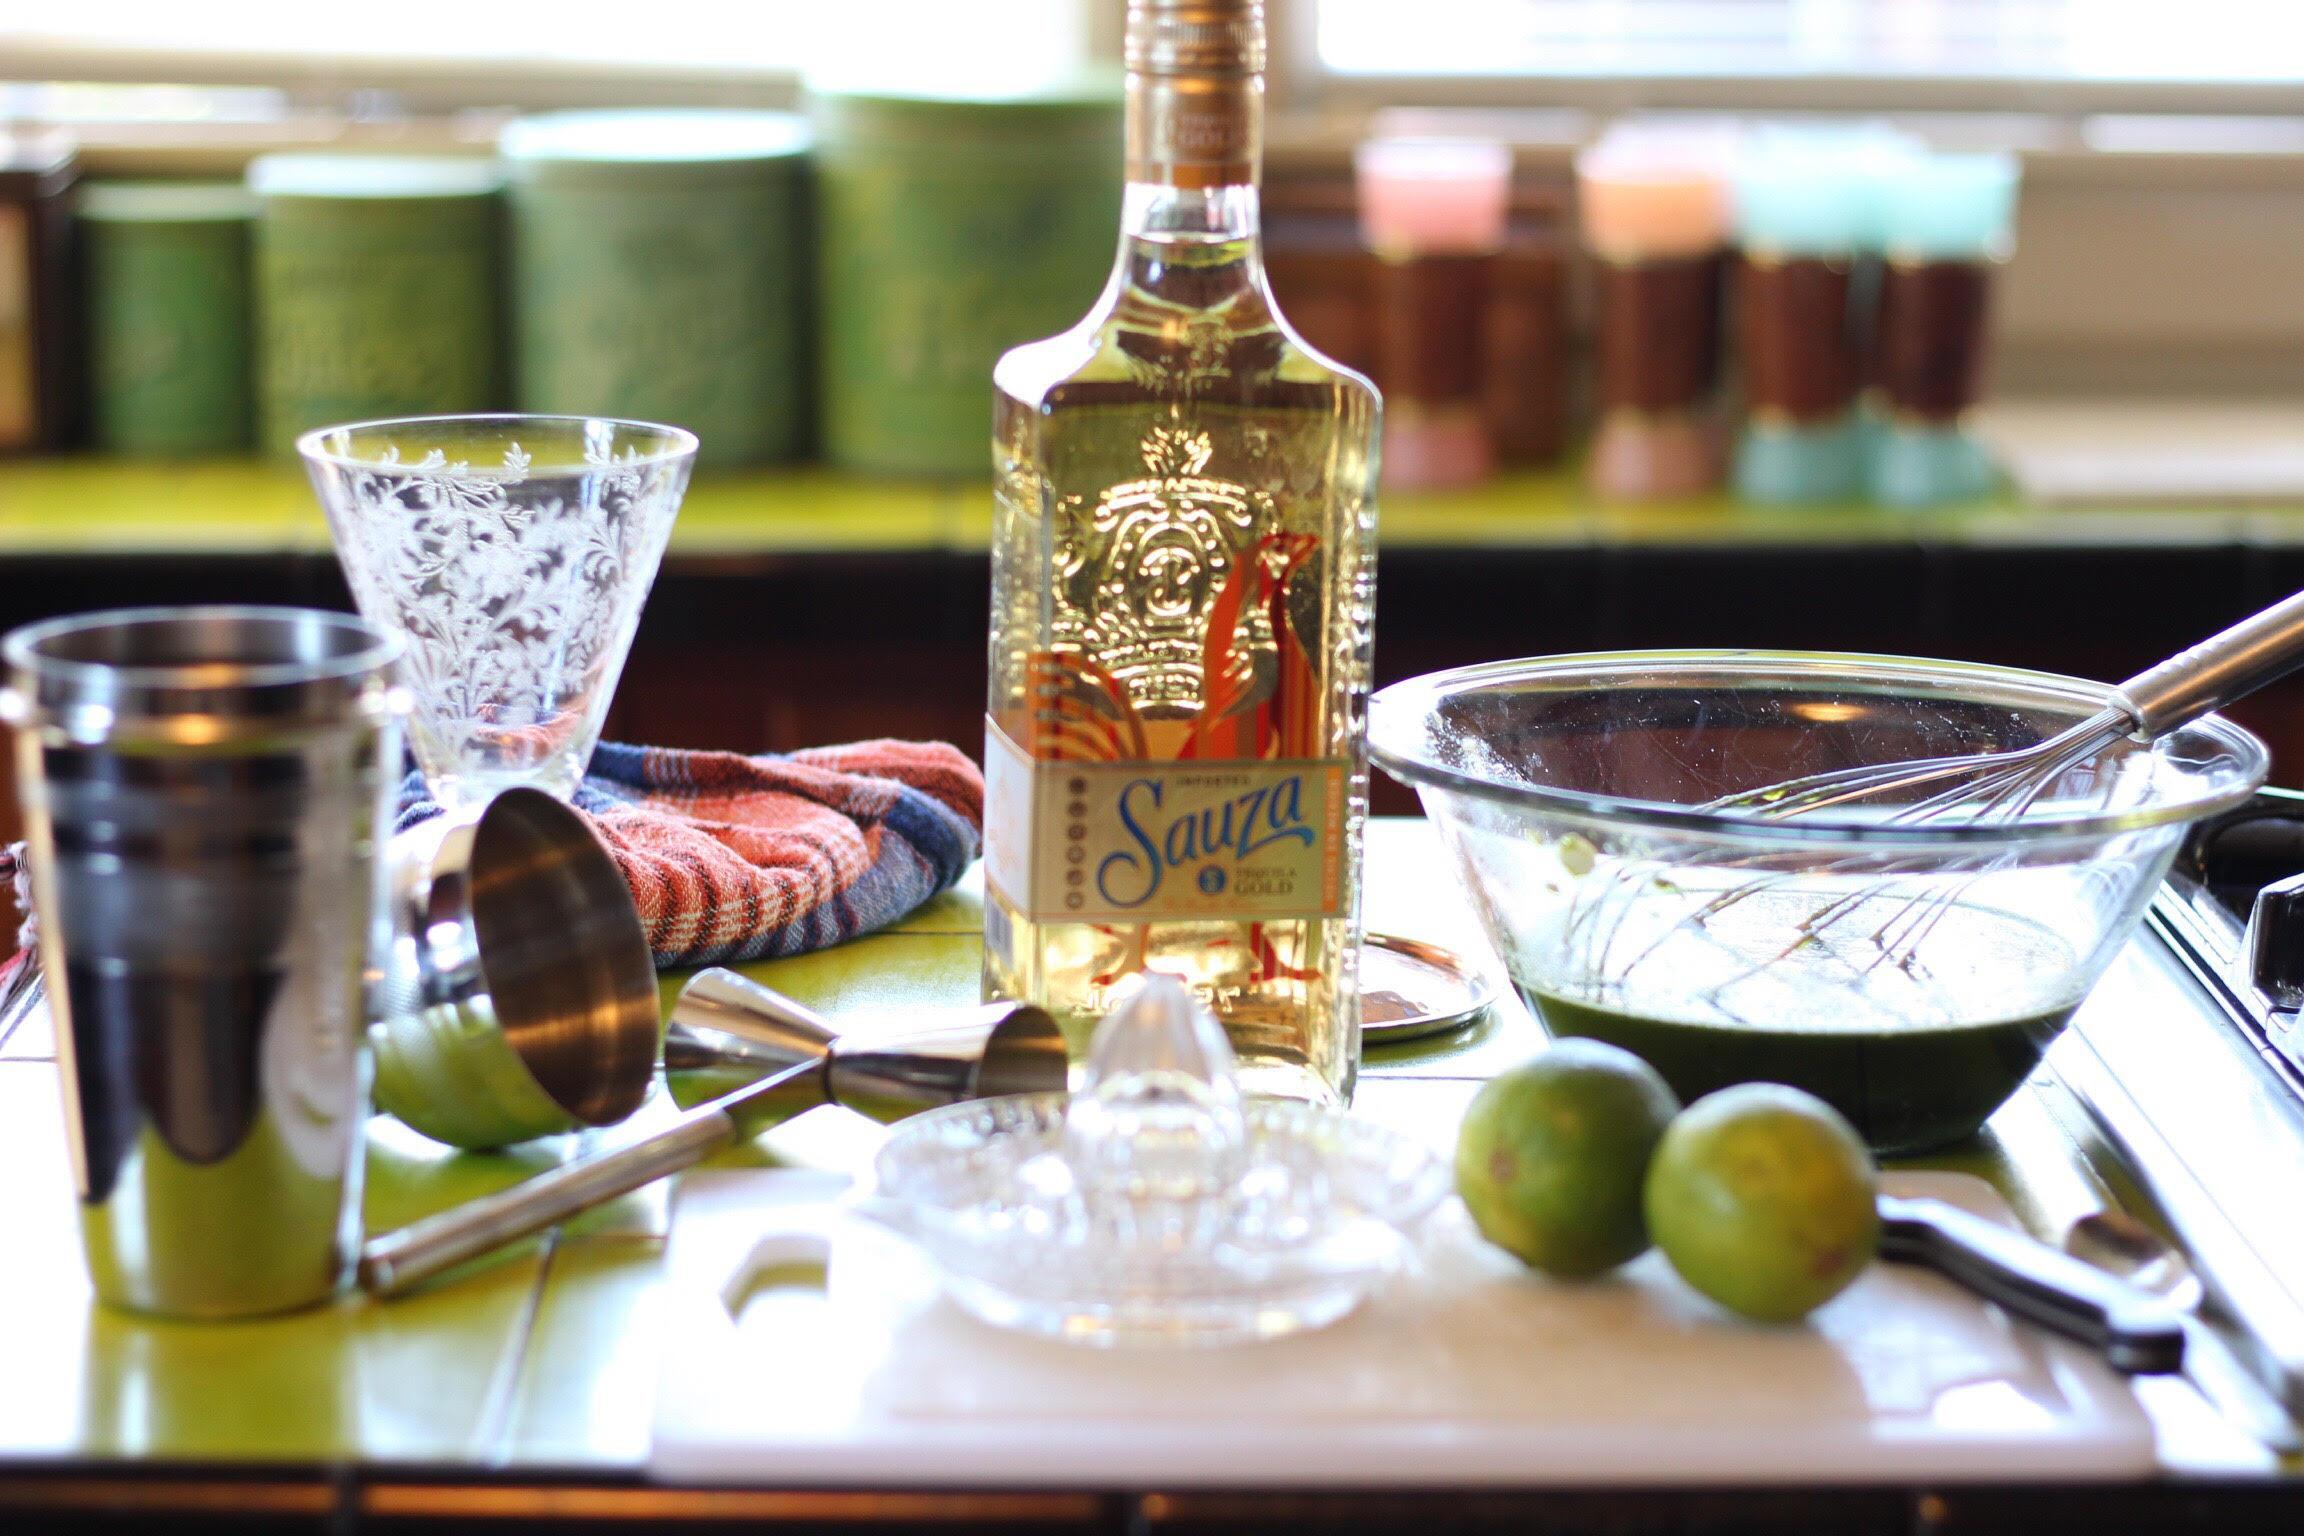 Pepita-Bonita-cocktails-and-craft.jpg